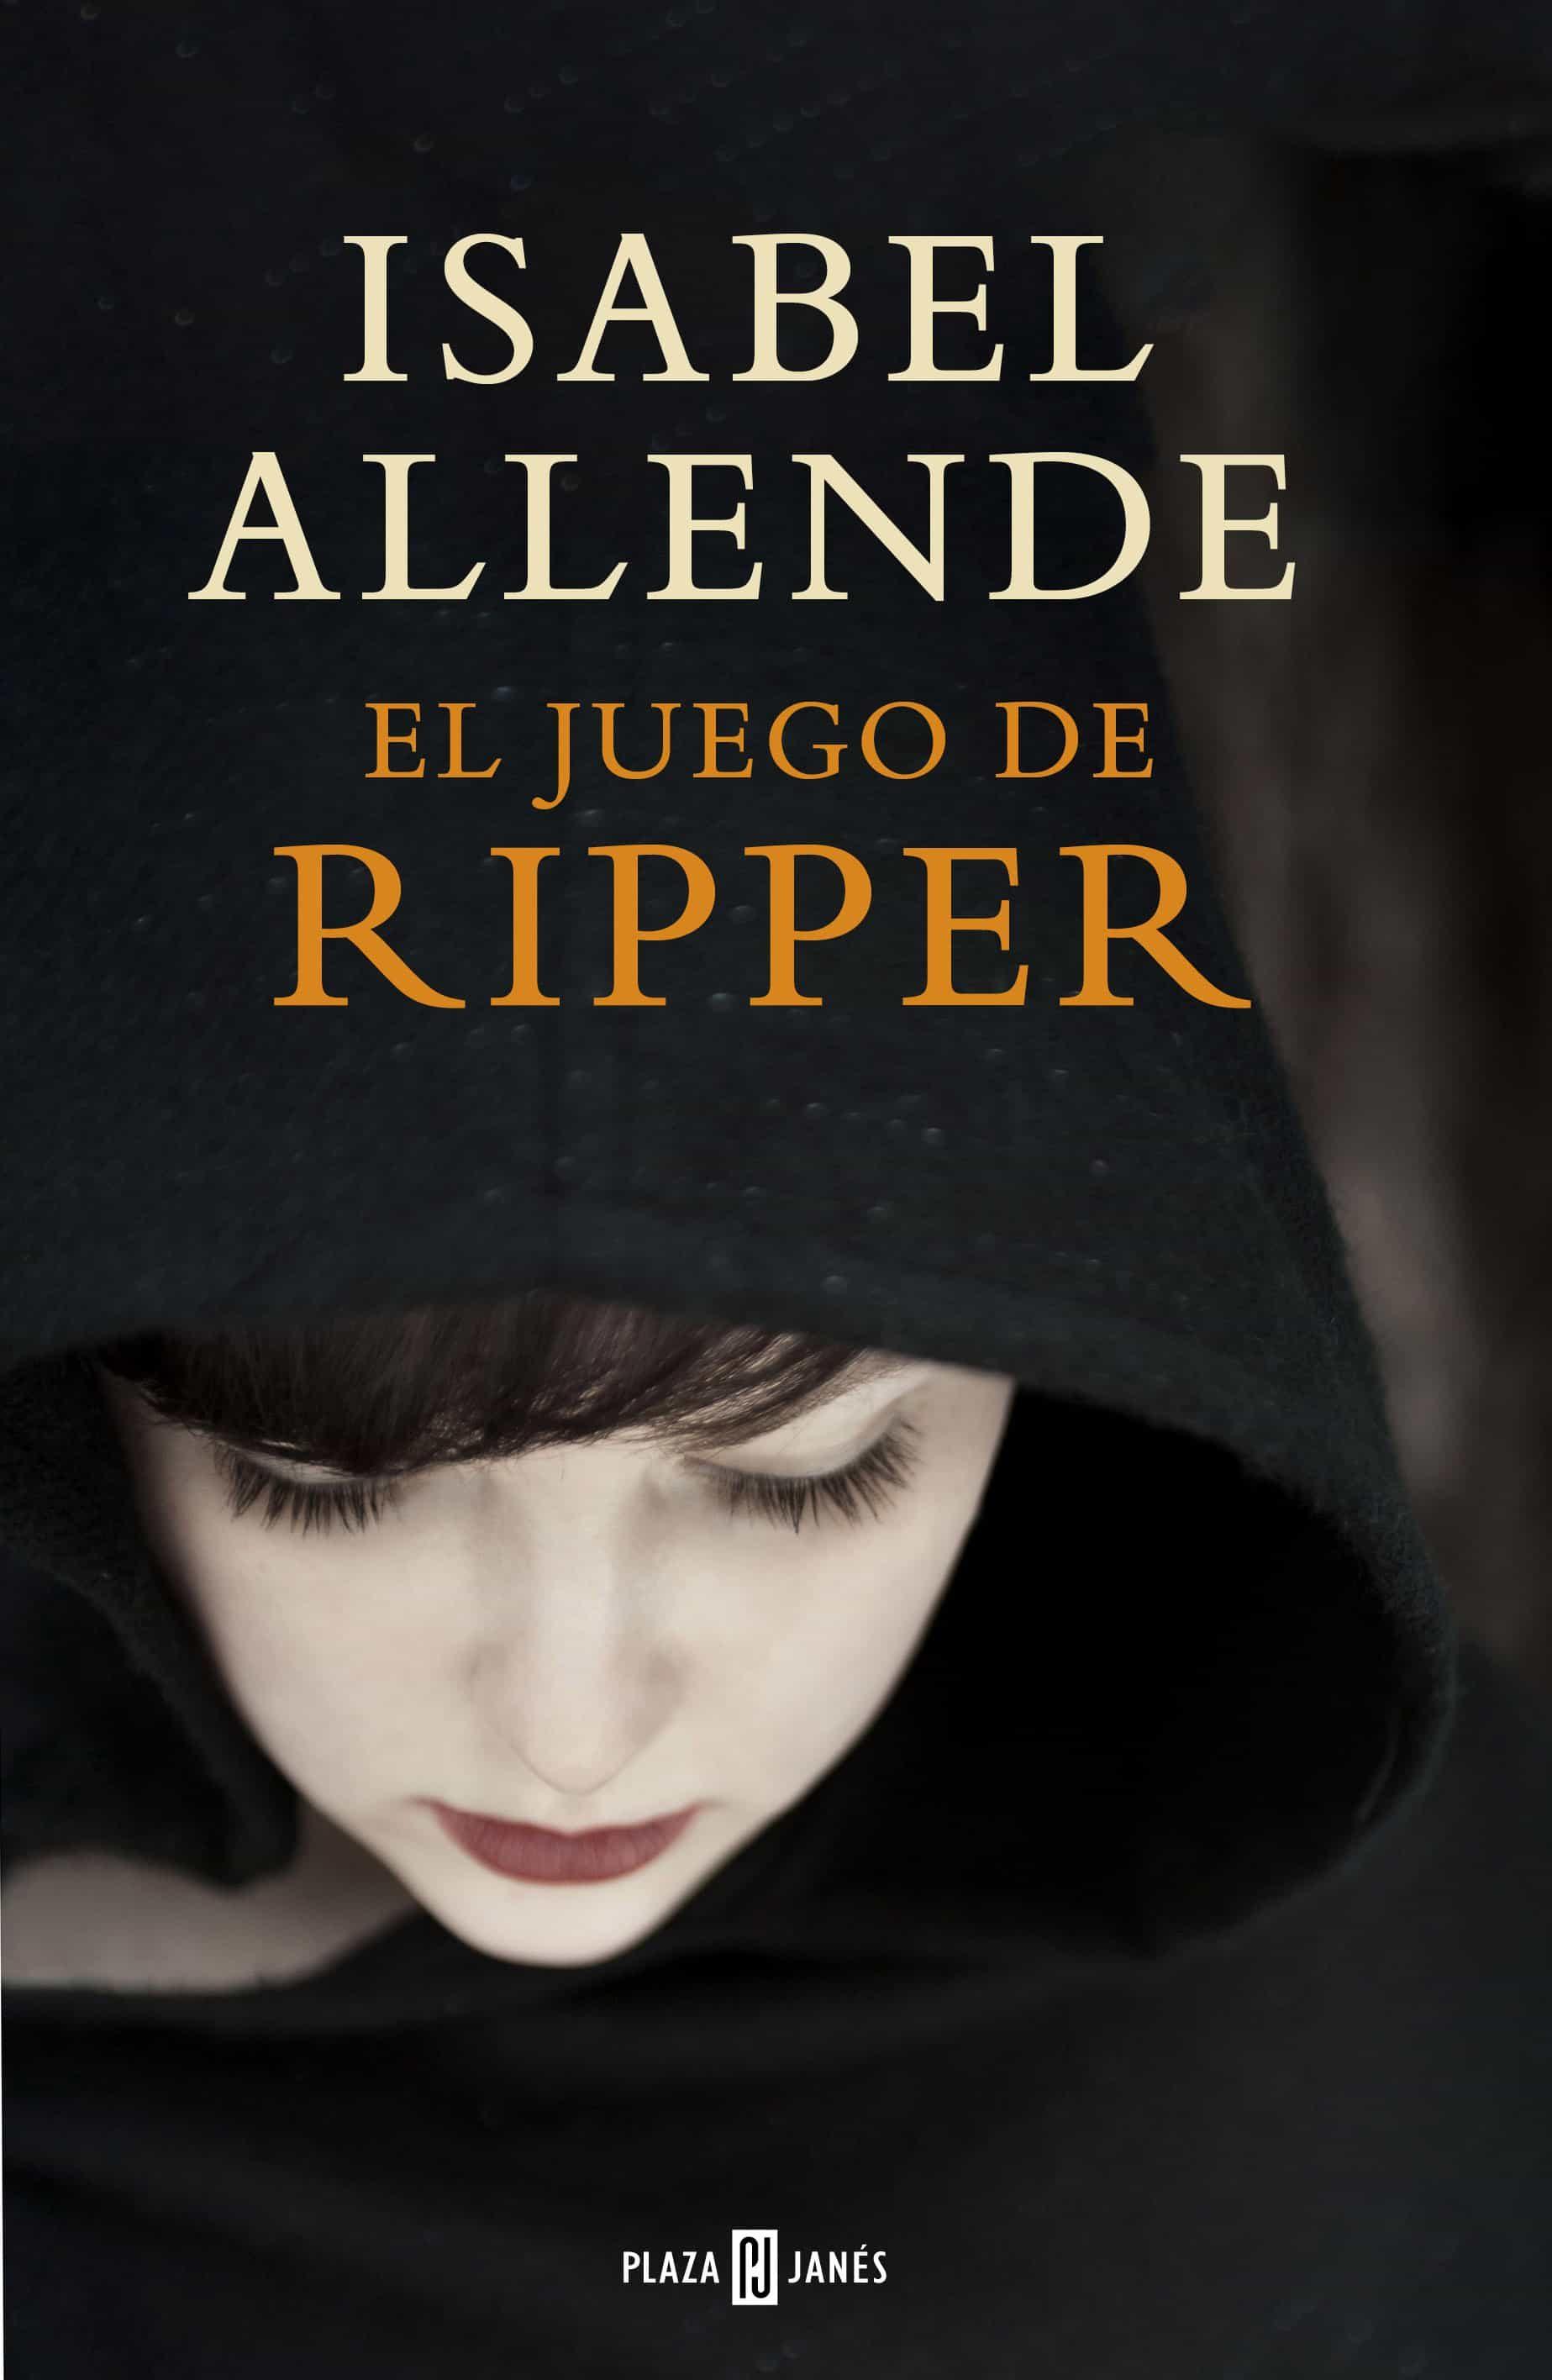 http://laorilladeloslibross.blogspot.com.es/2014/03/titulo-el-juego-de-ripper-autora-isabel.html